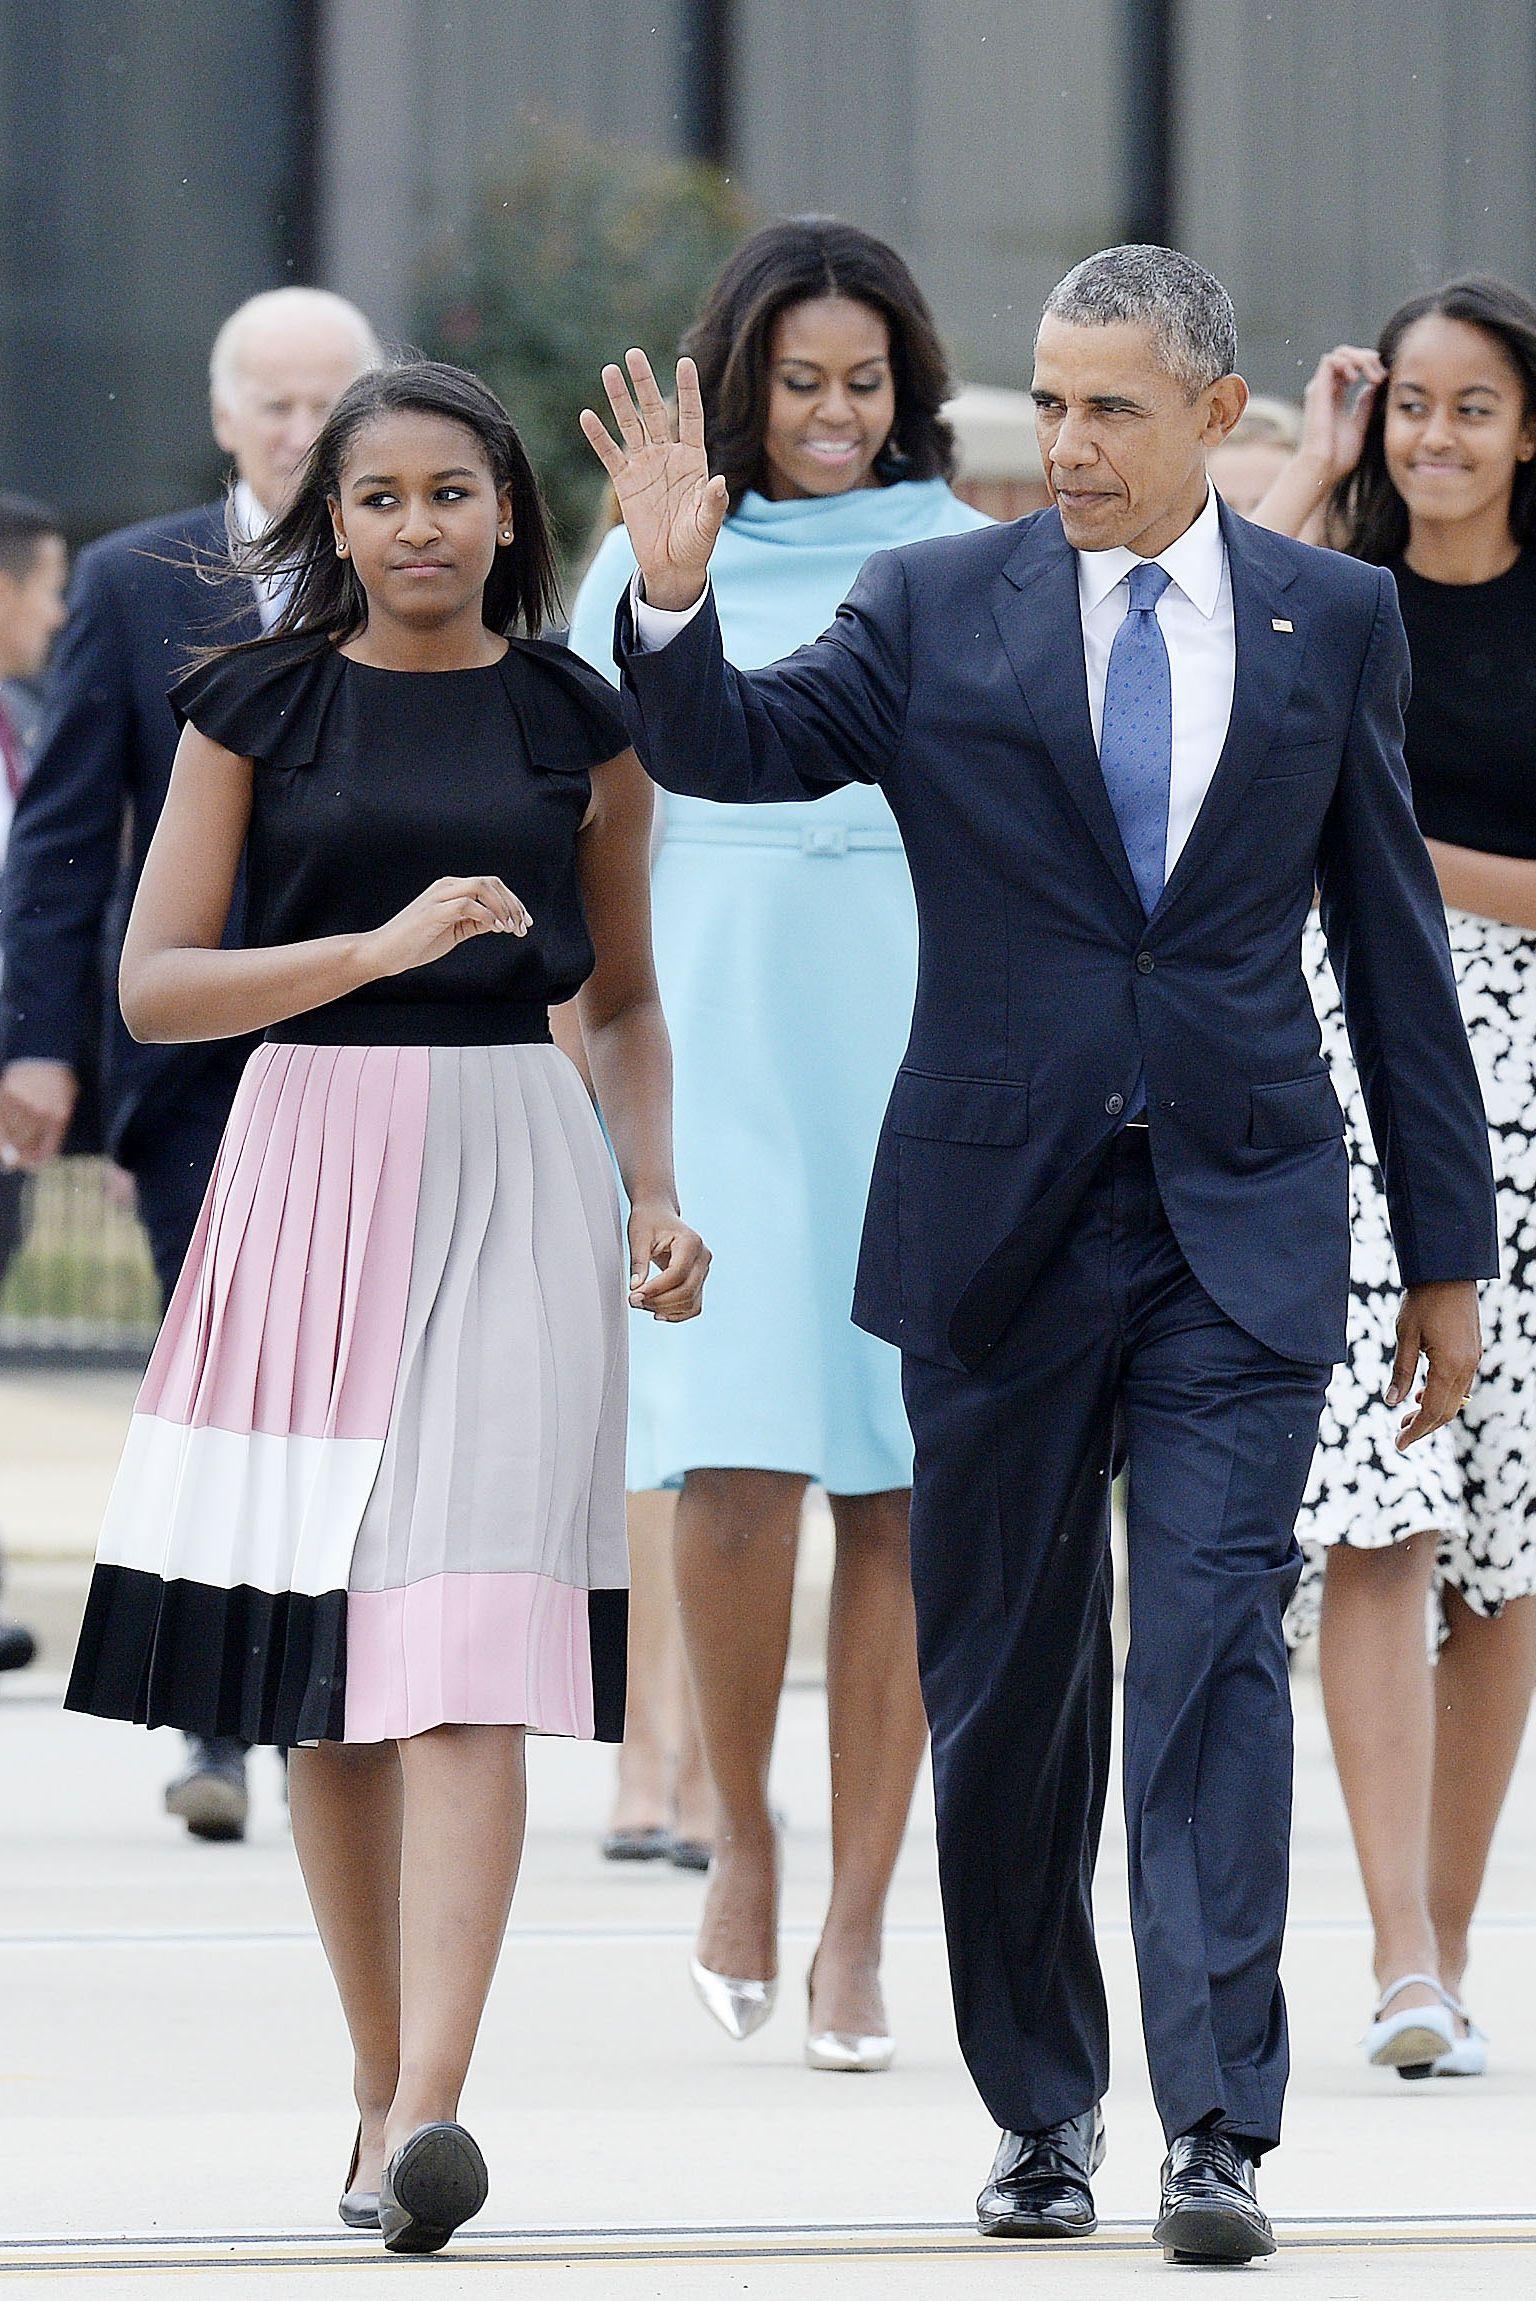 Sasha Obama wearing one of the brand's designs.